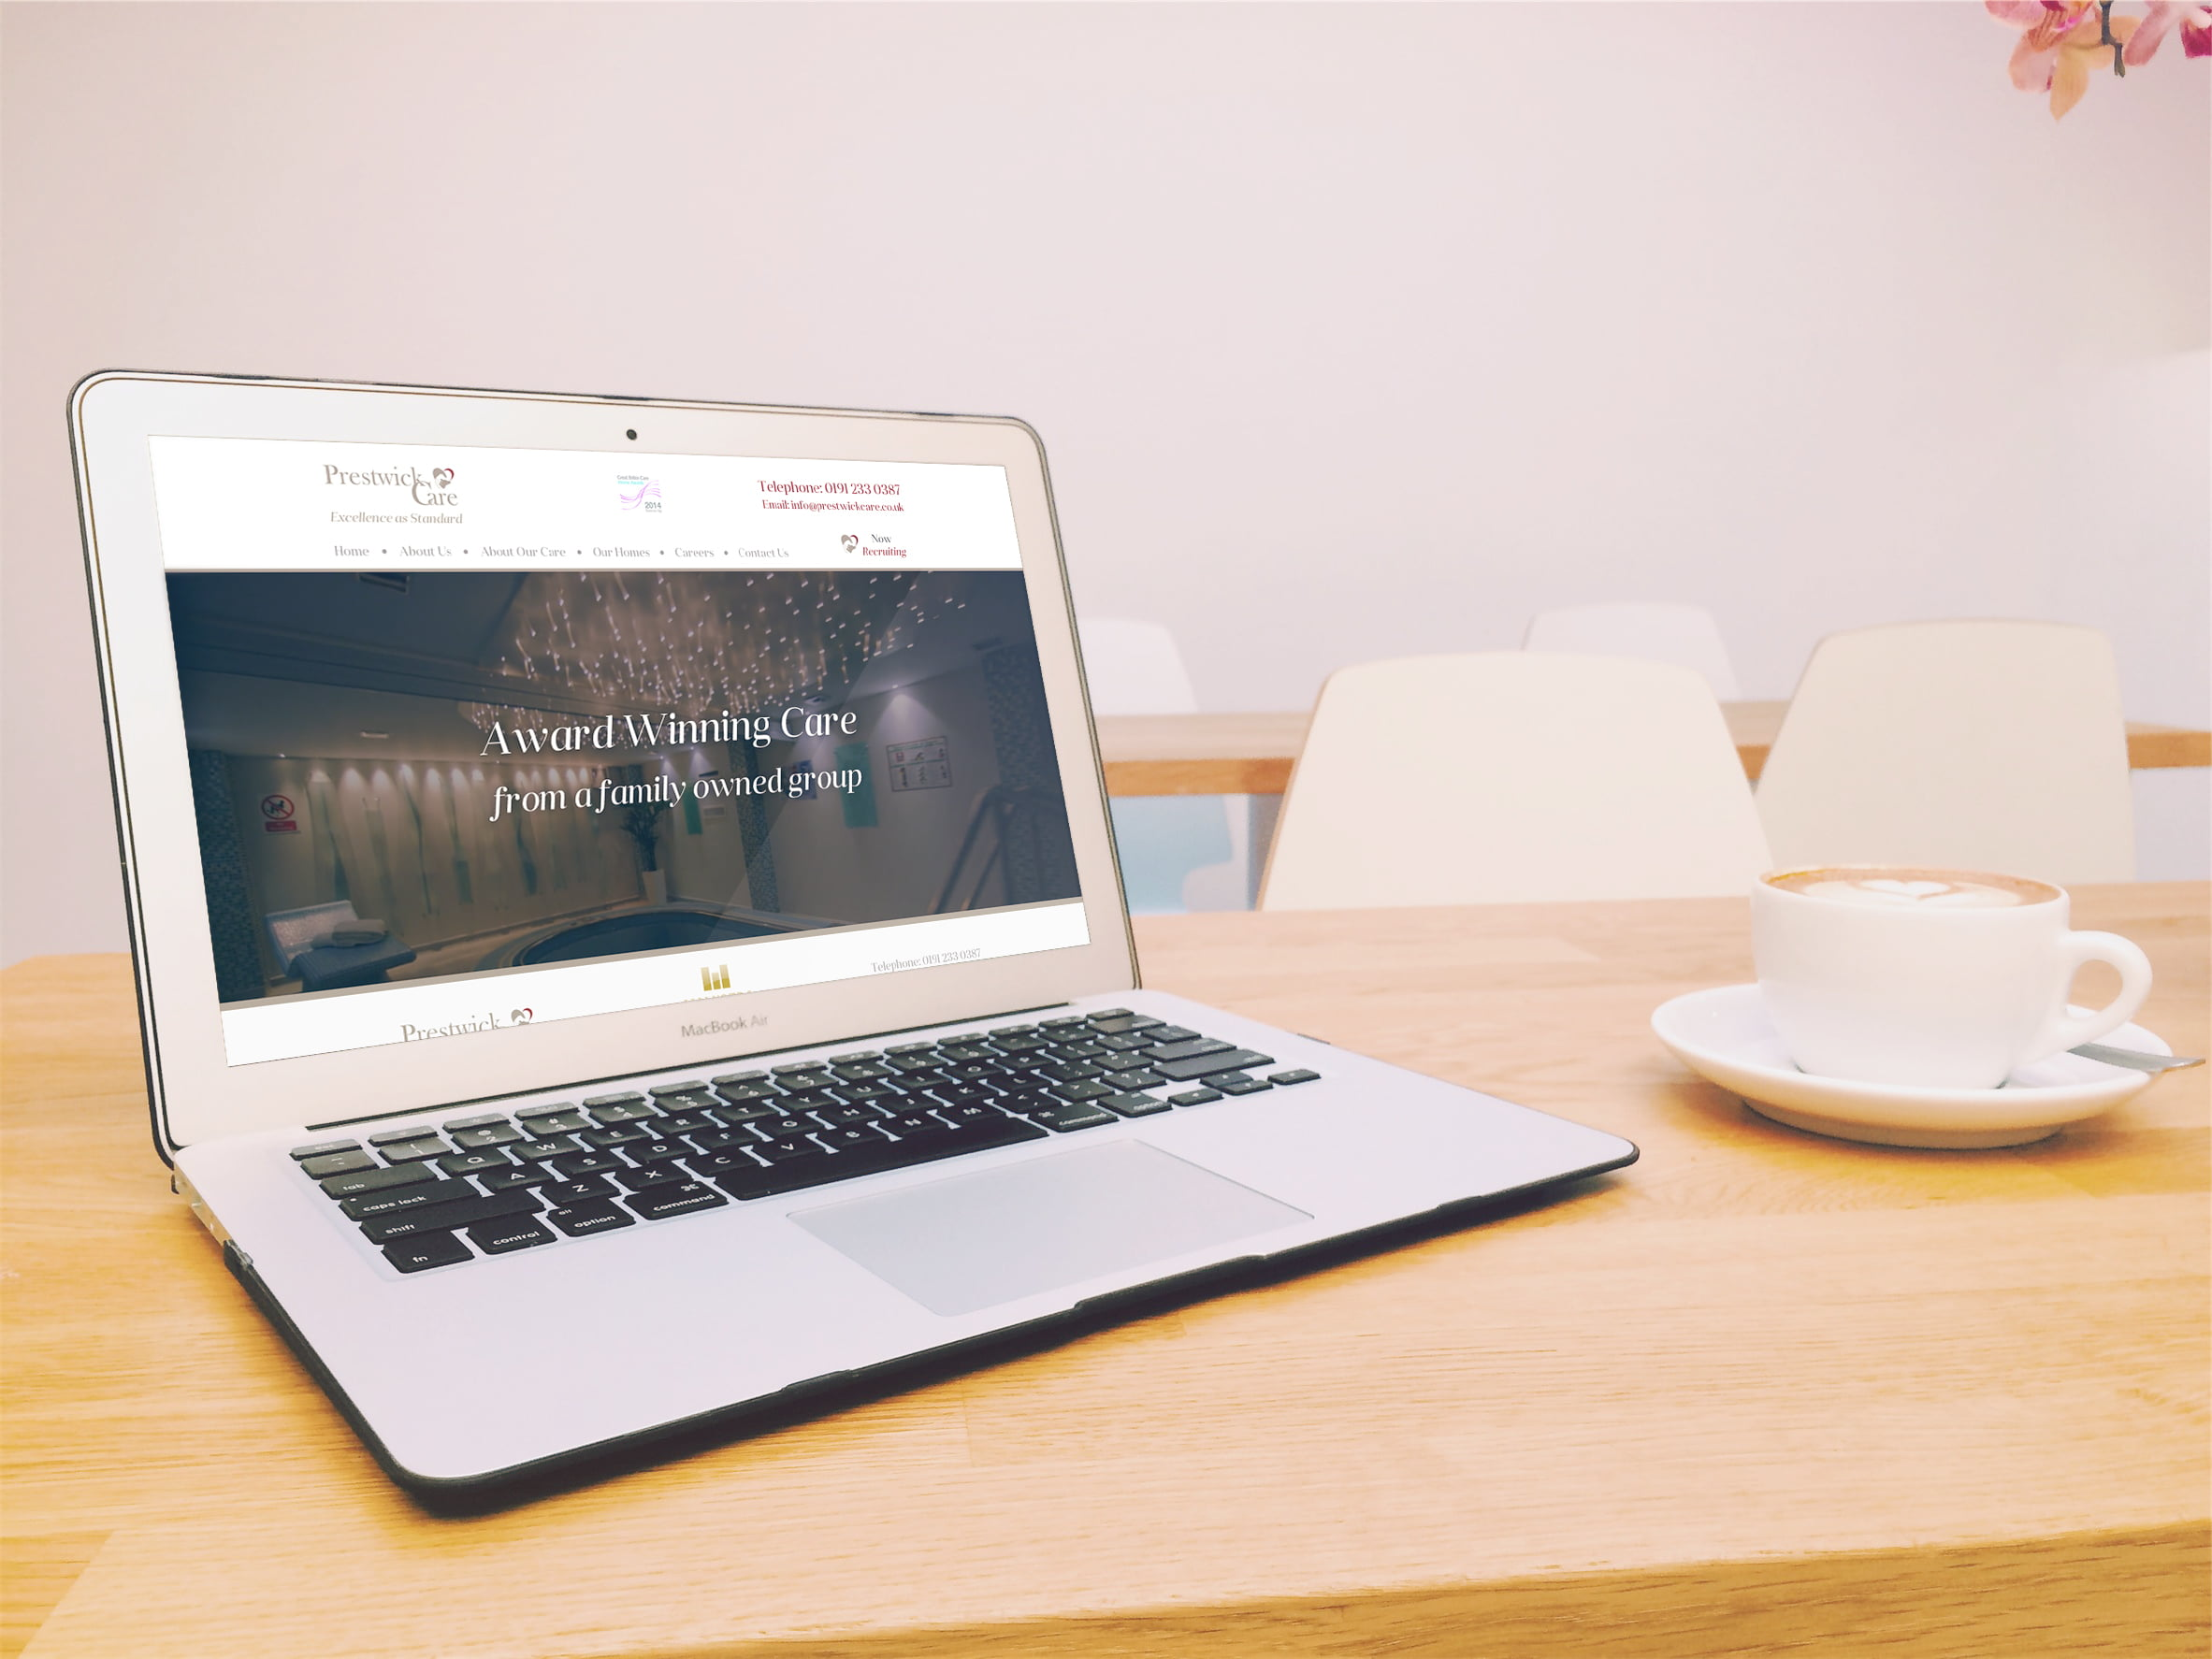 Prestwick Care website displayed on laptop